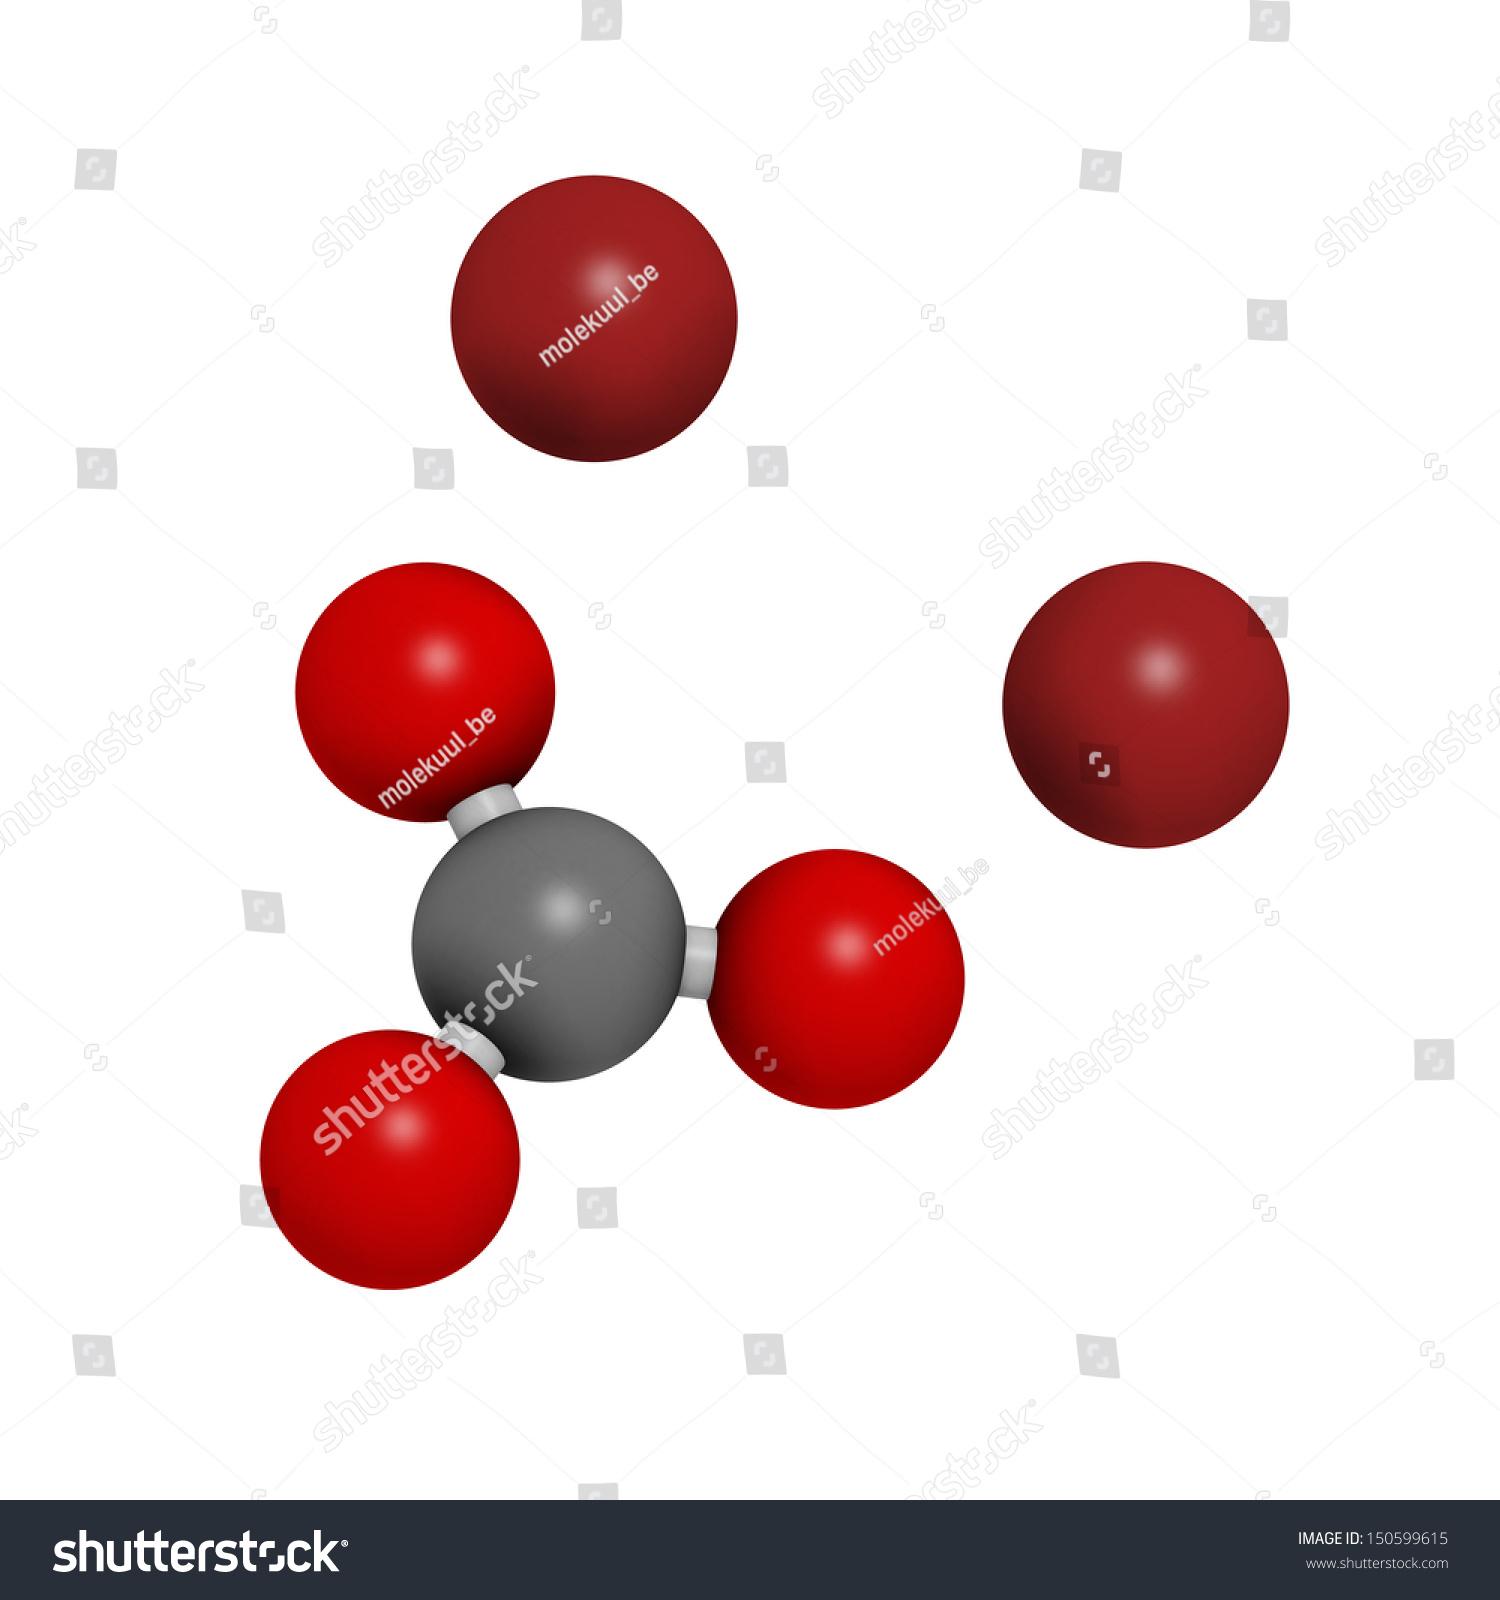 Lithium Carbonate Li 2 CO 3 Bipolar Disorder Drug Stock Illustration